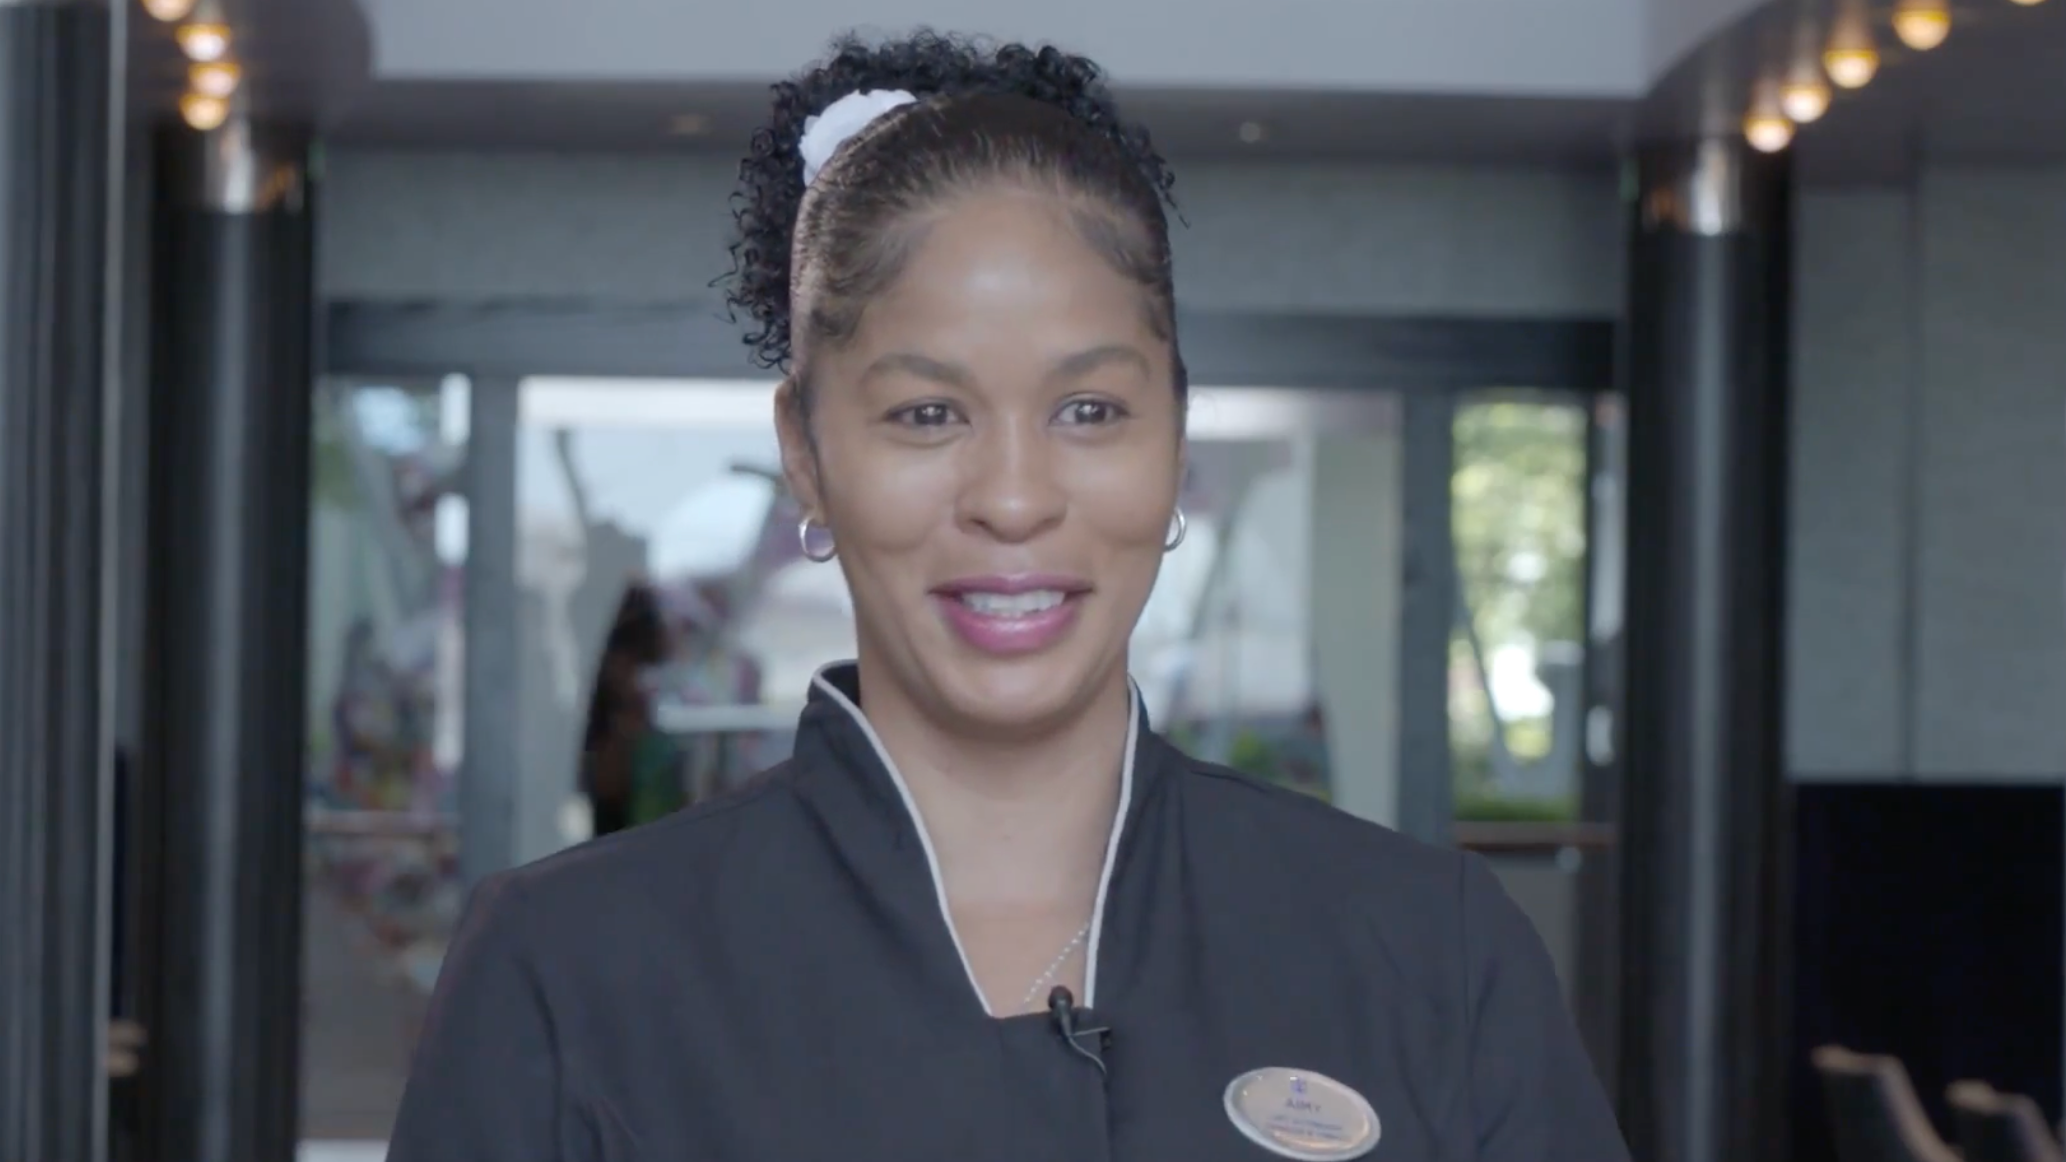 Aimy, Stateroom attendant - Trinidad